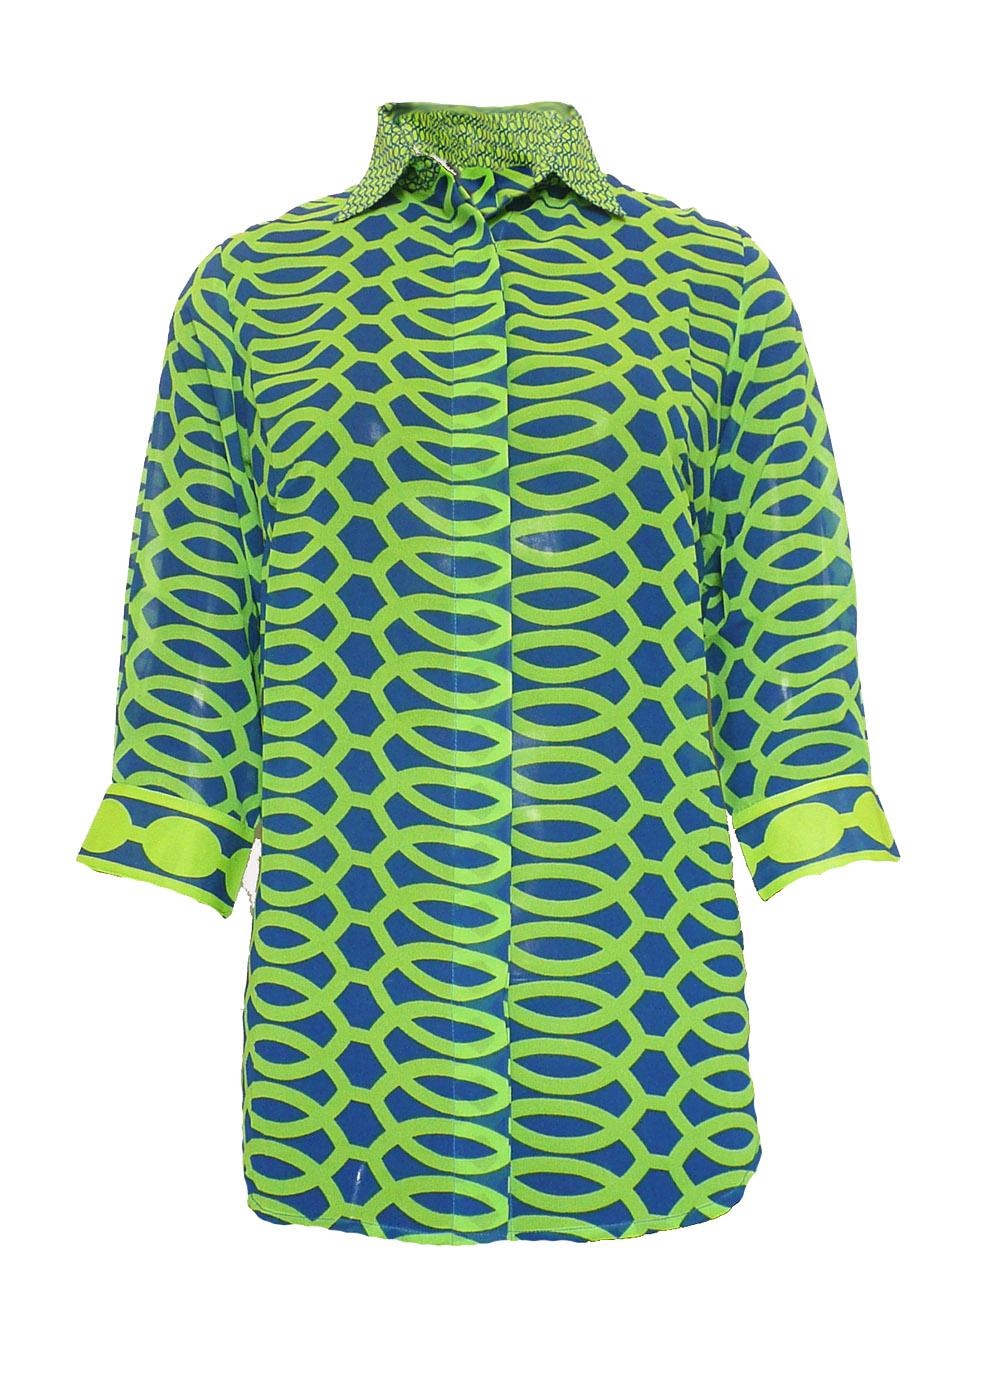 shirt green prnt.jpg